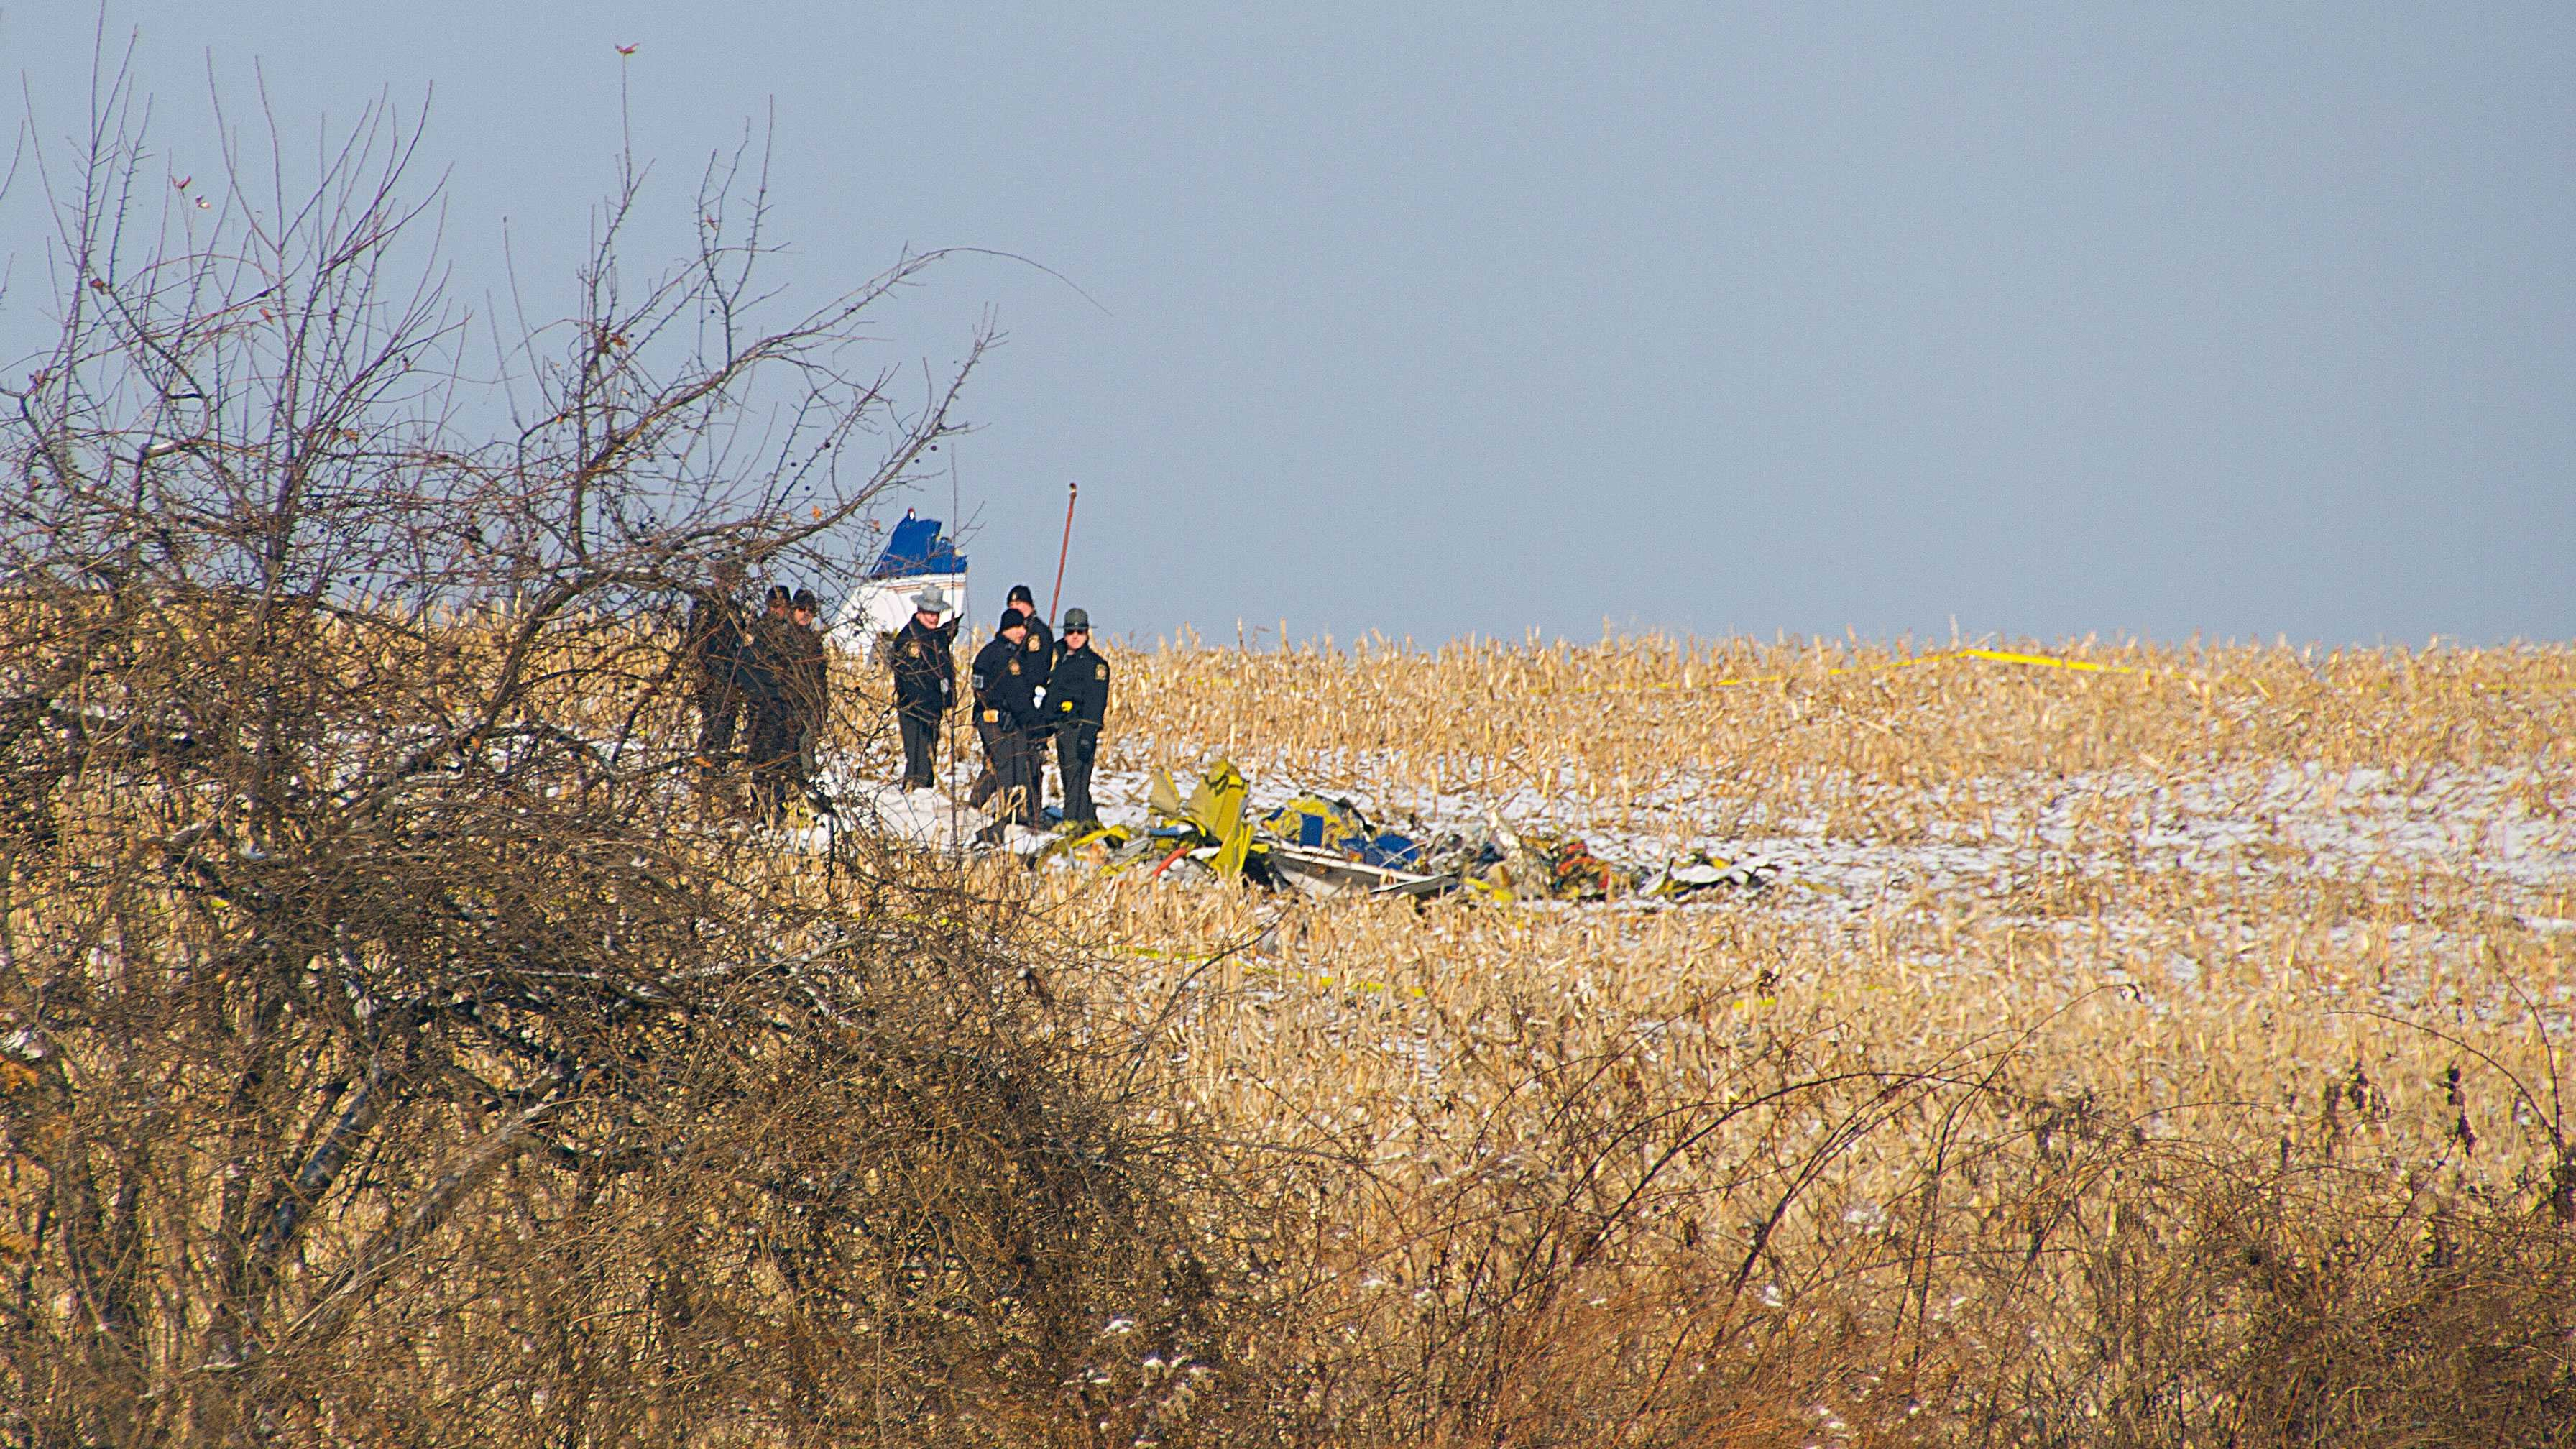 12.26 plane crash